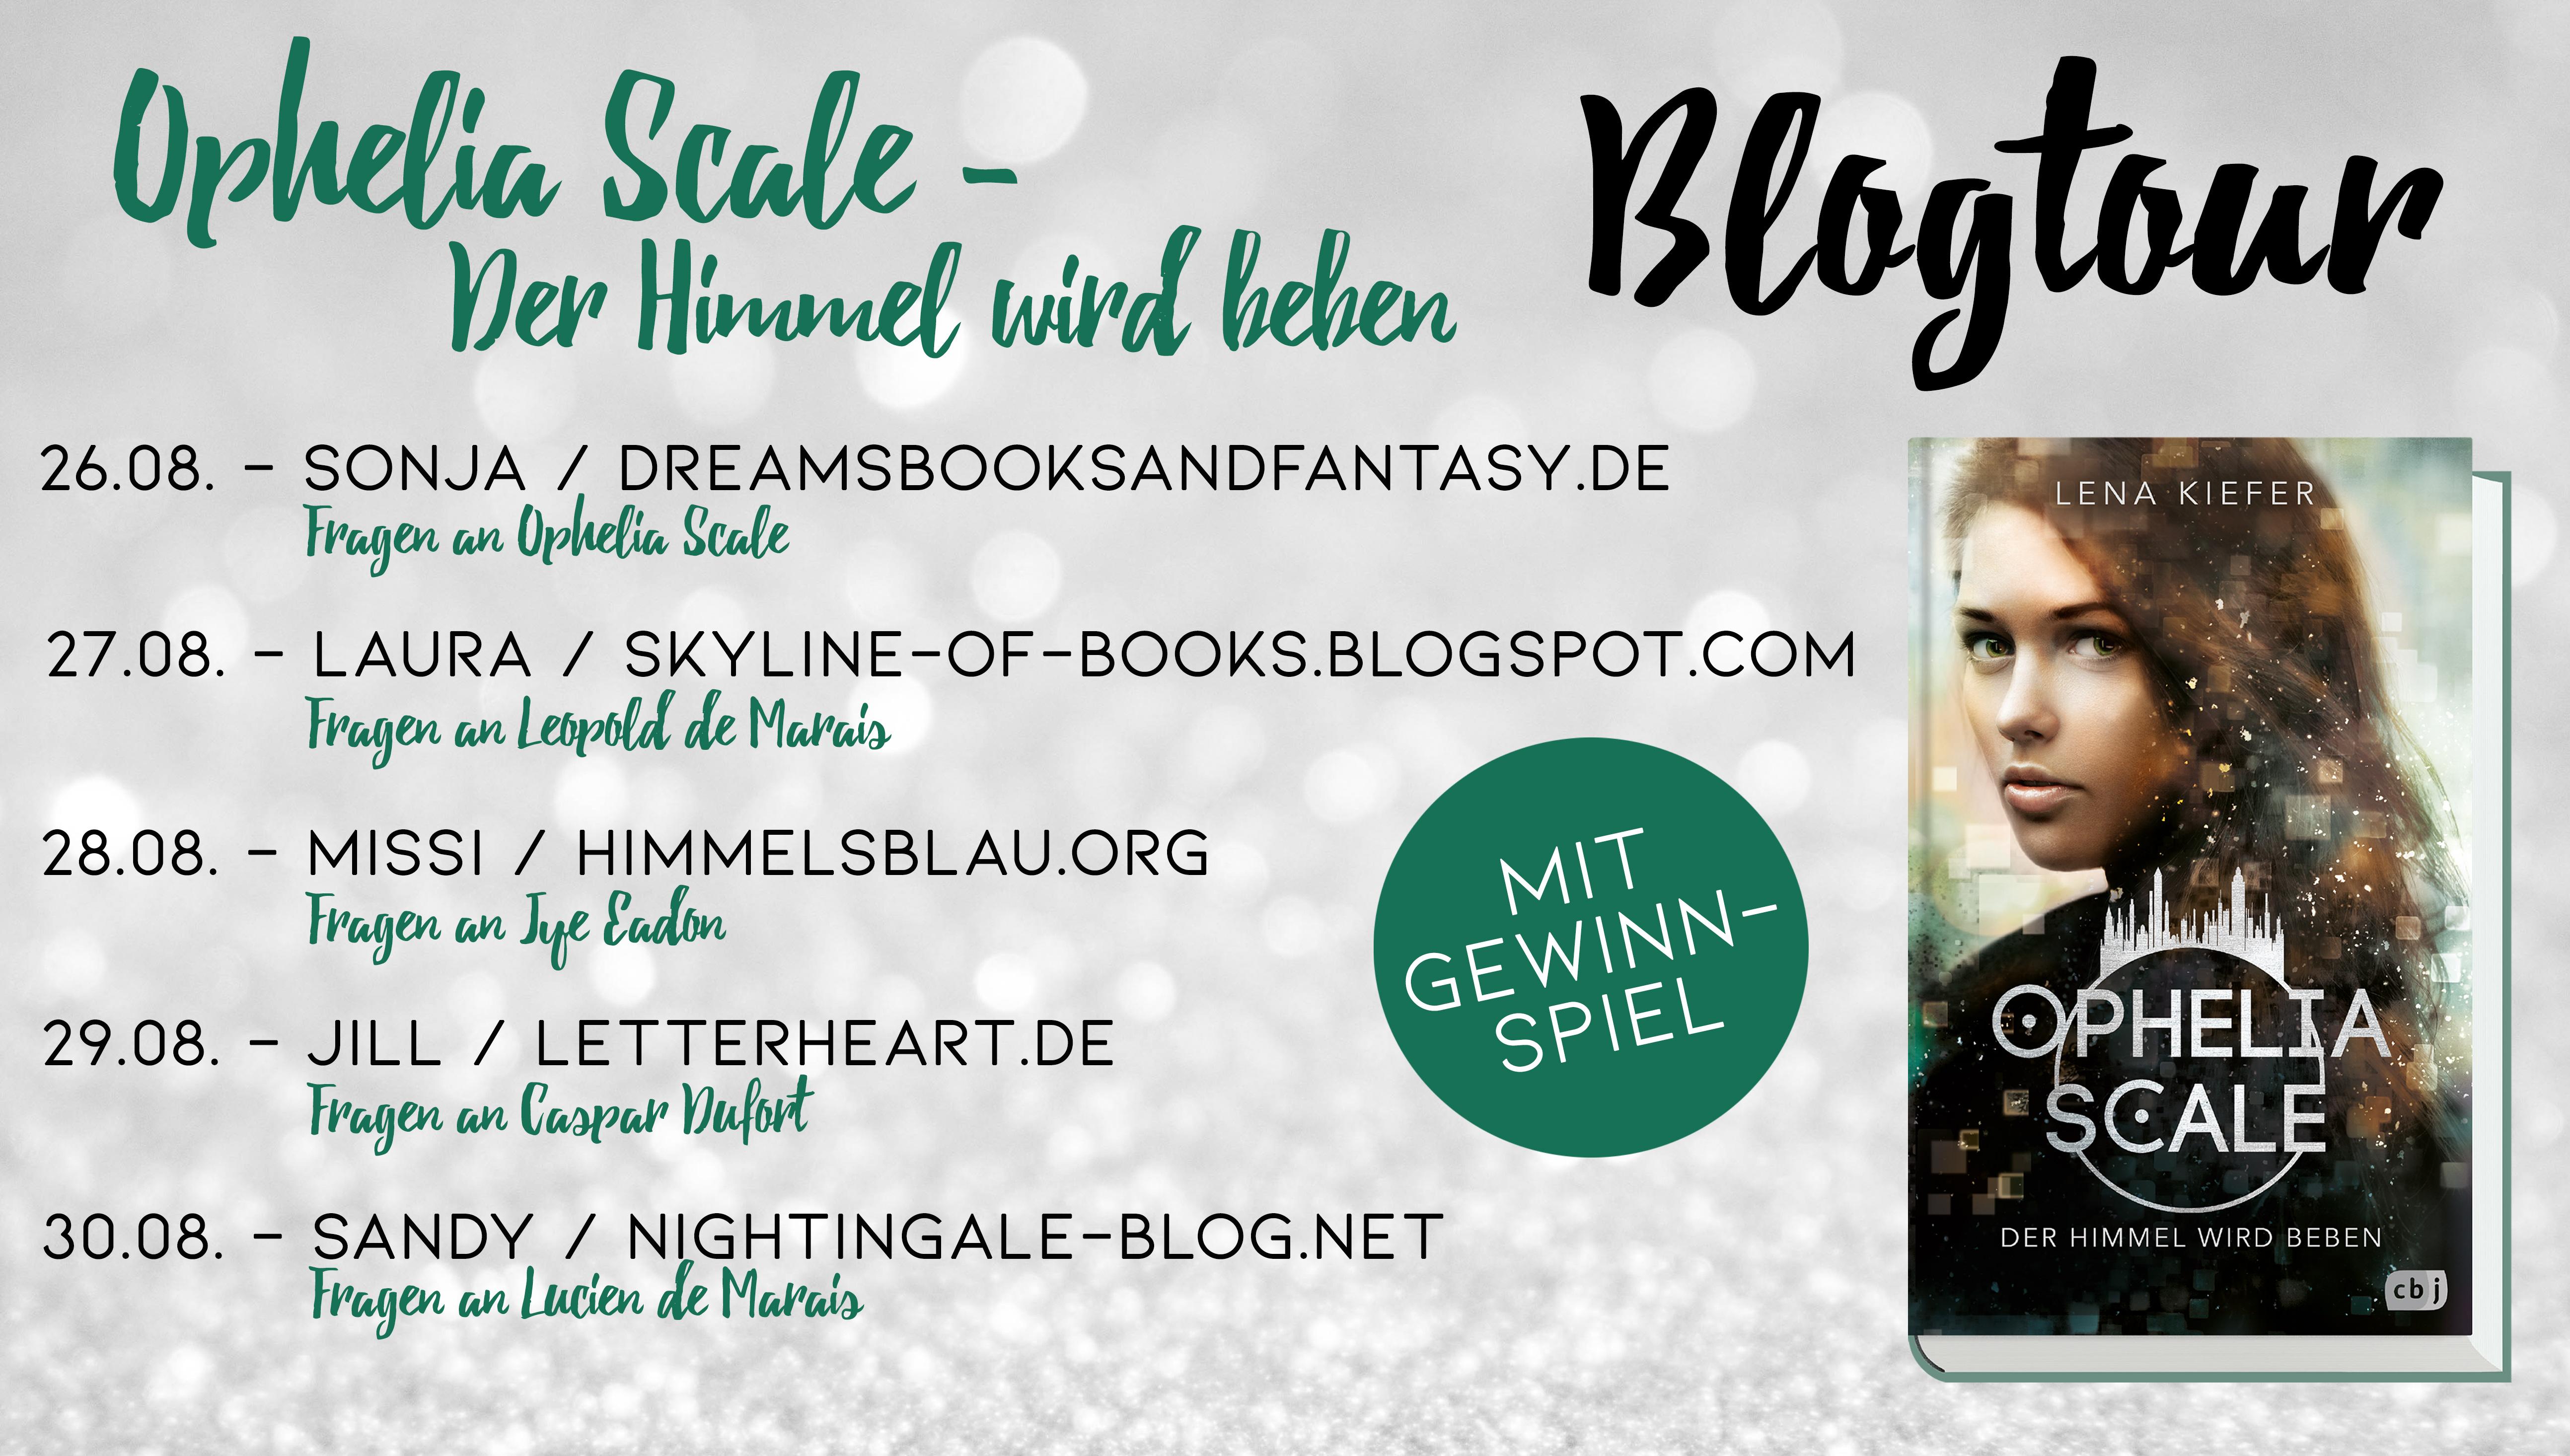 Blogtour - Ophelia Scale